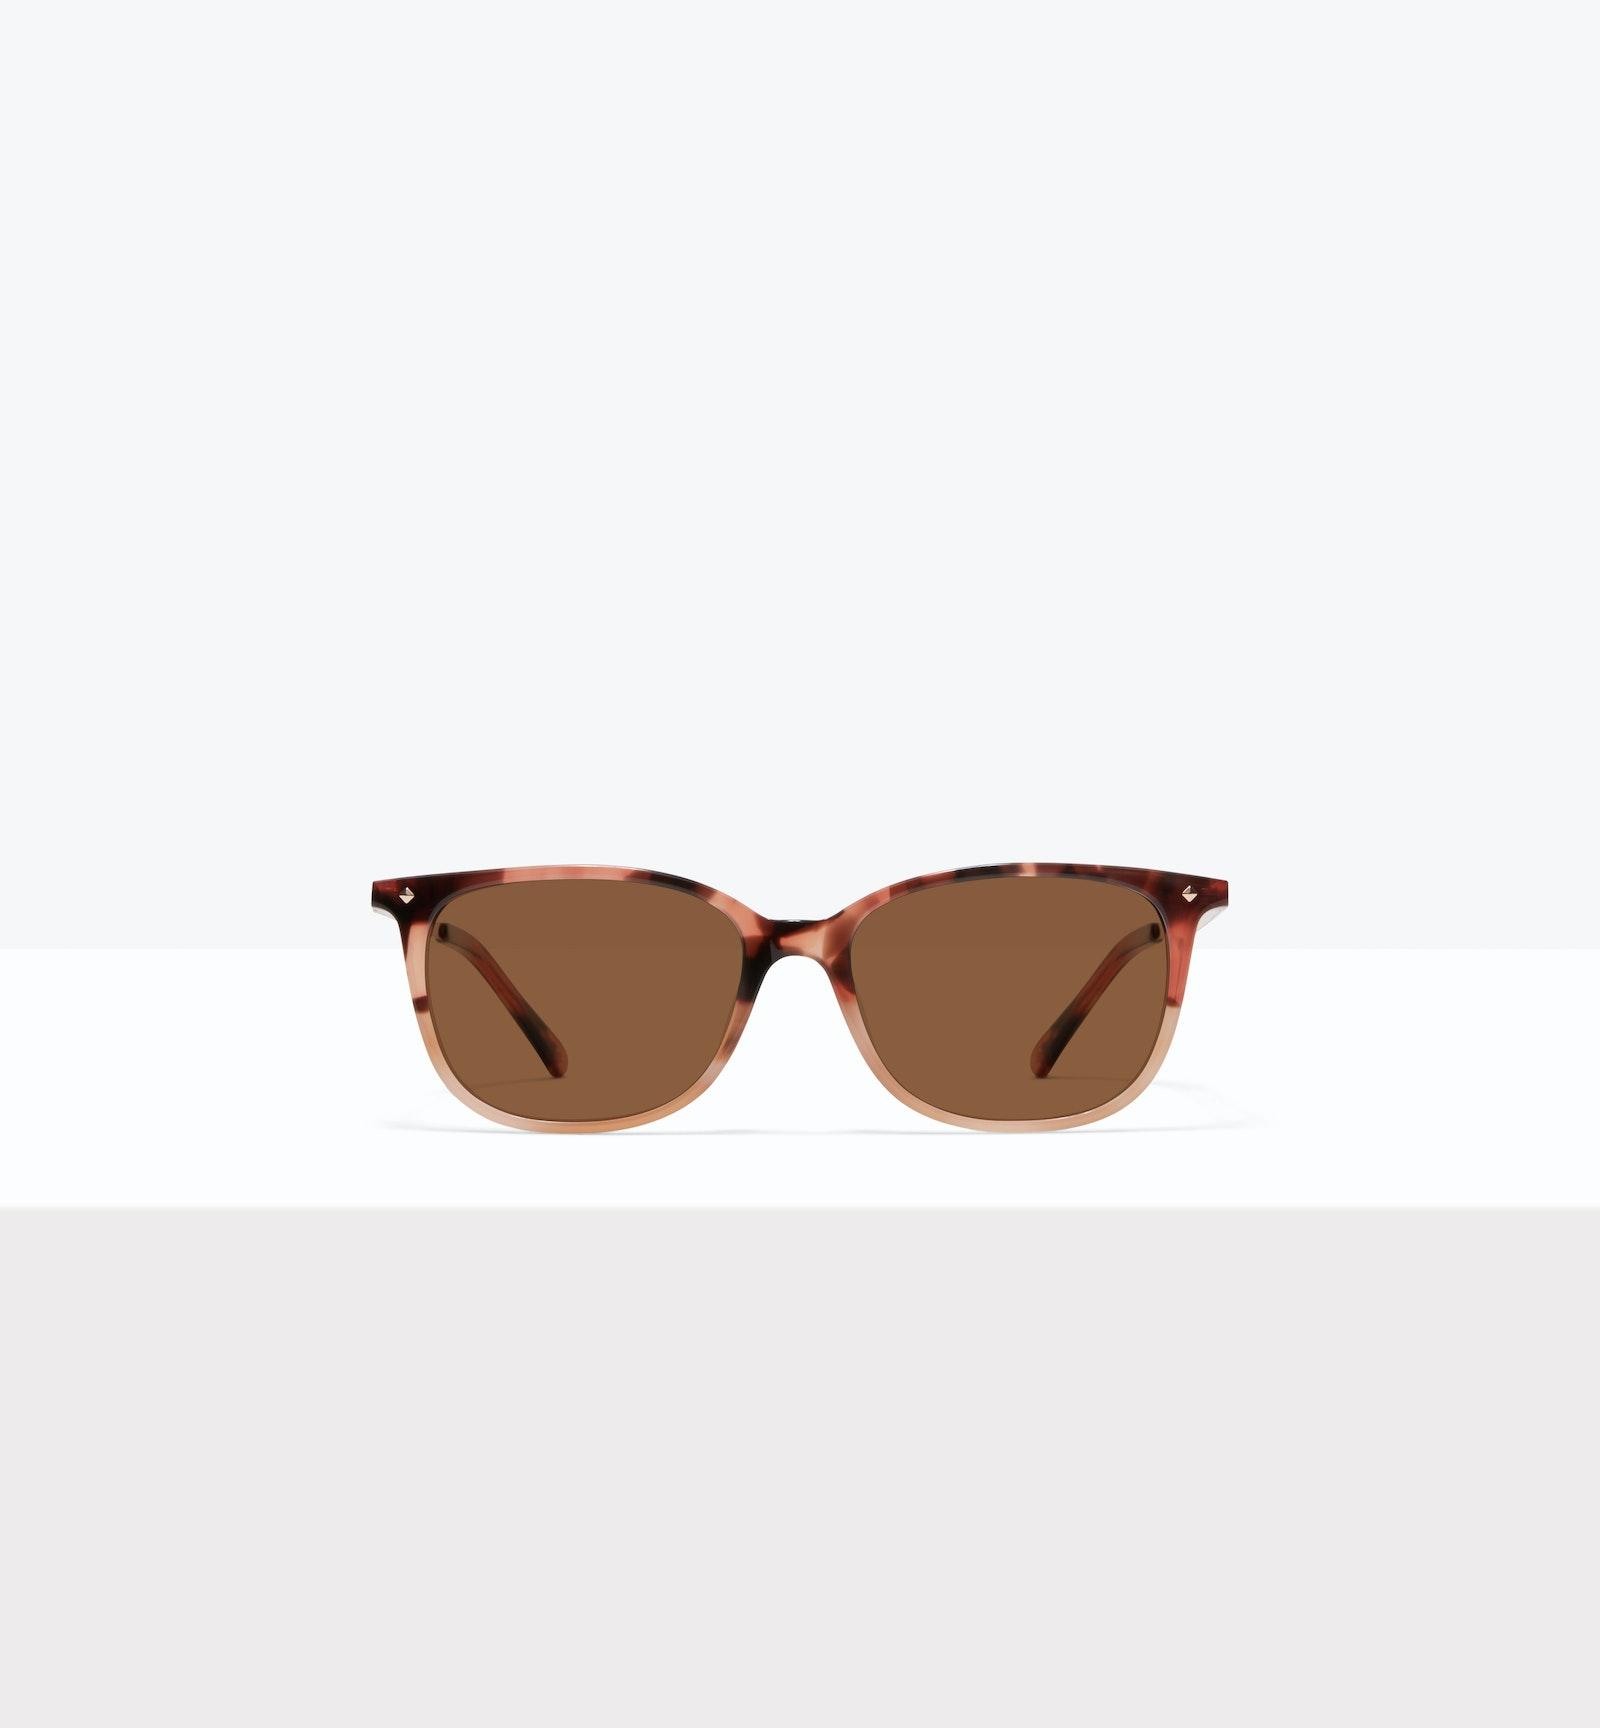 Affordable Fashion Glasses Rectangle Square Sunglasses Women Refine M Two Tone Pink Tort